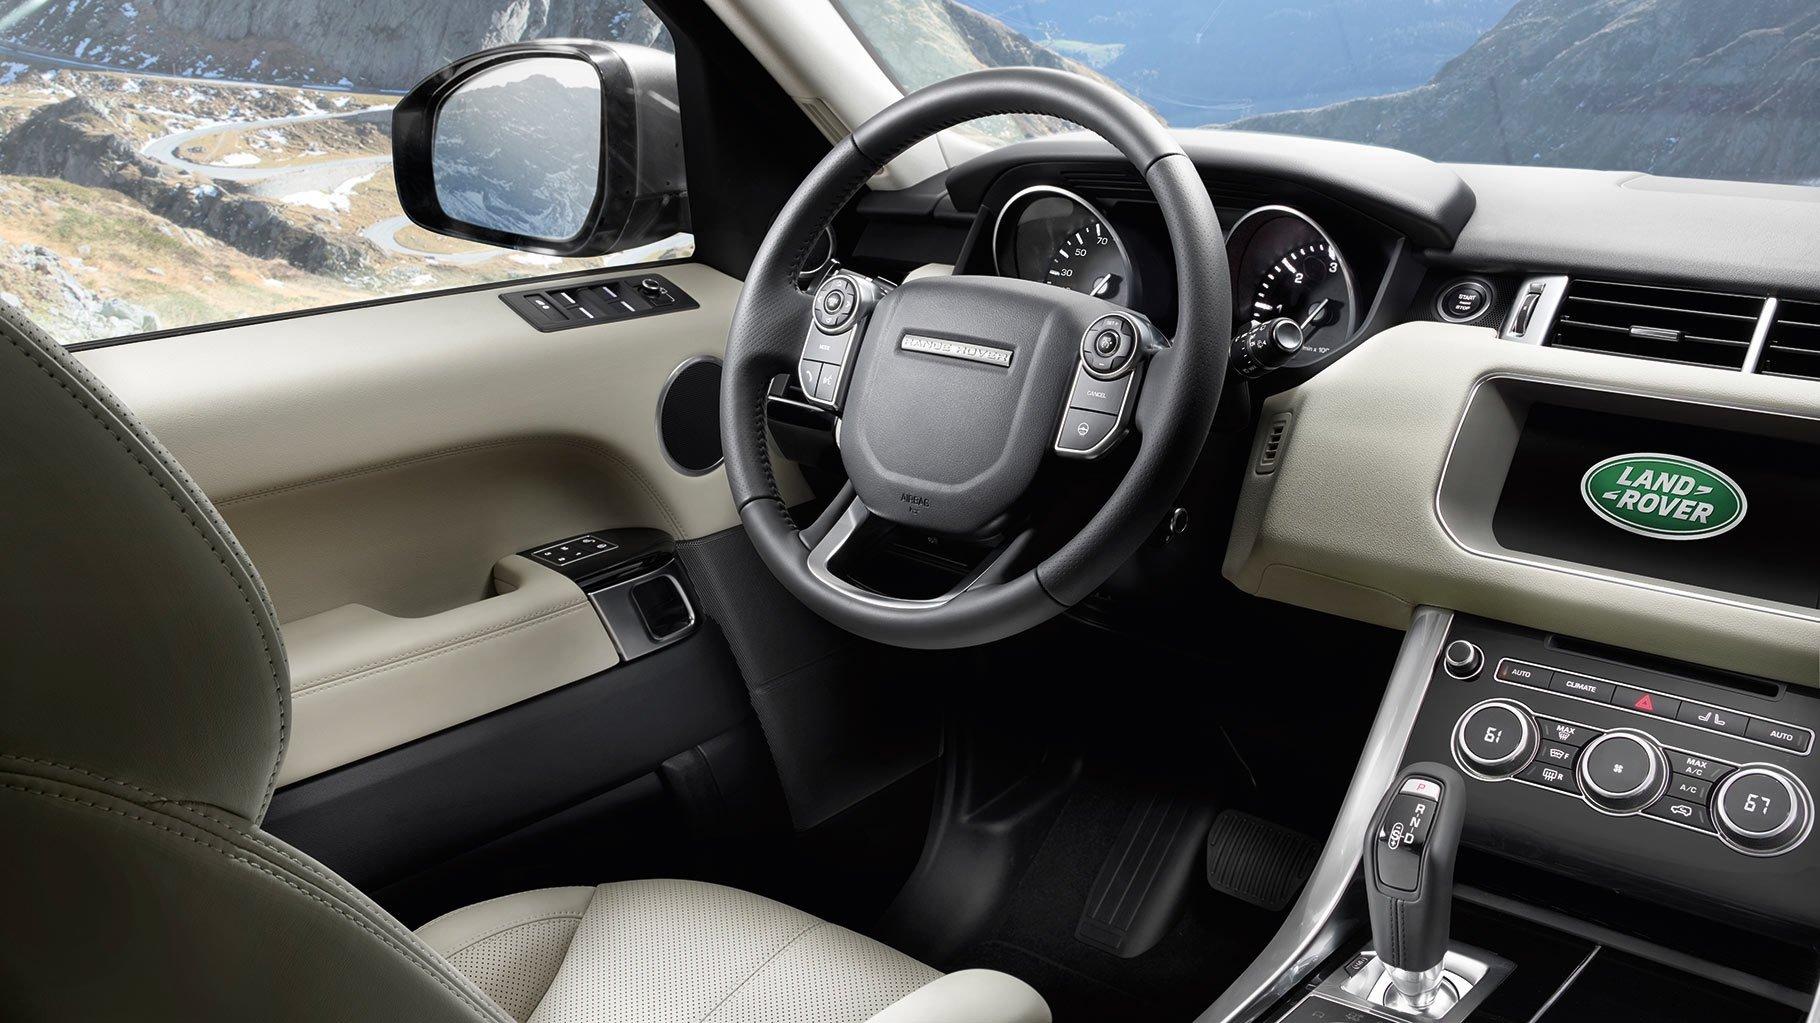 2017 Land Rover Range Rover Sport Front Interior